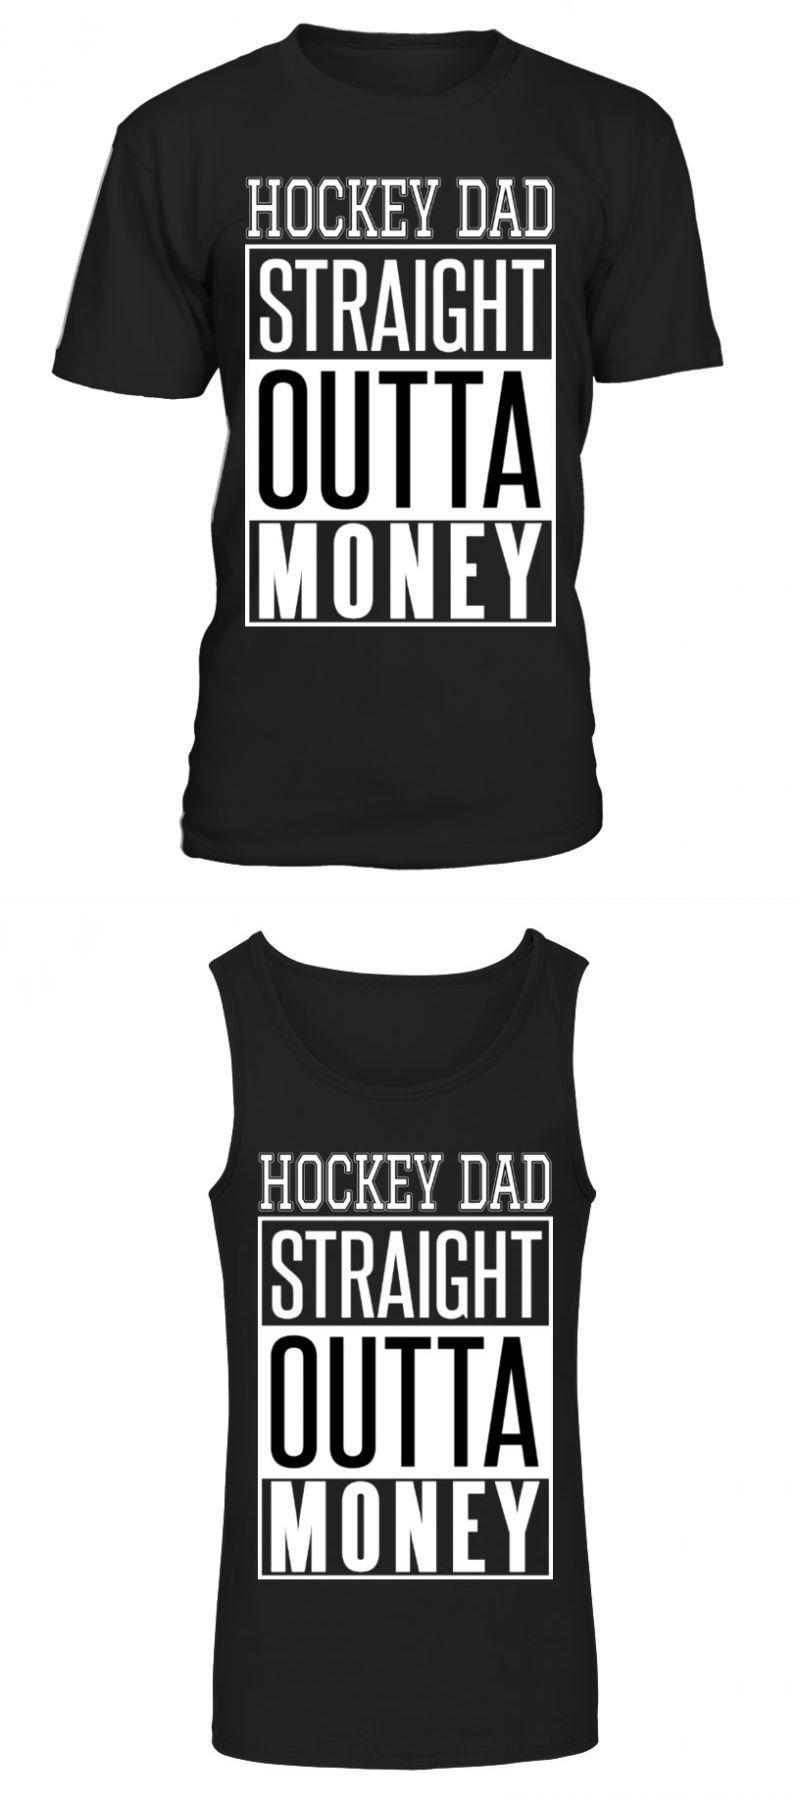 153f1553a Hockey t shirt near me hockey dad straight outta money true hockey t shirt # hockey #shirt #near #me #dad #straight #outta #money #true #oversized  #round ...